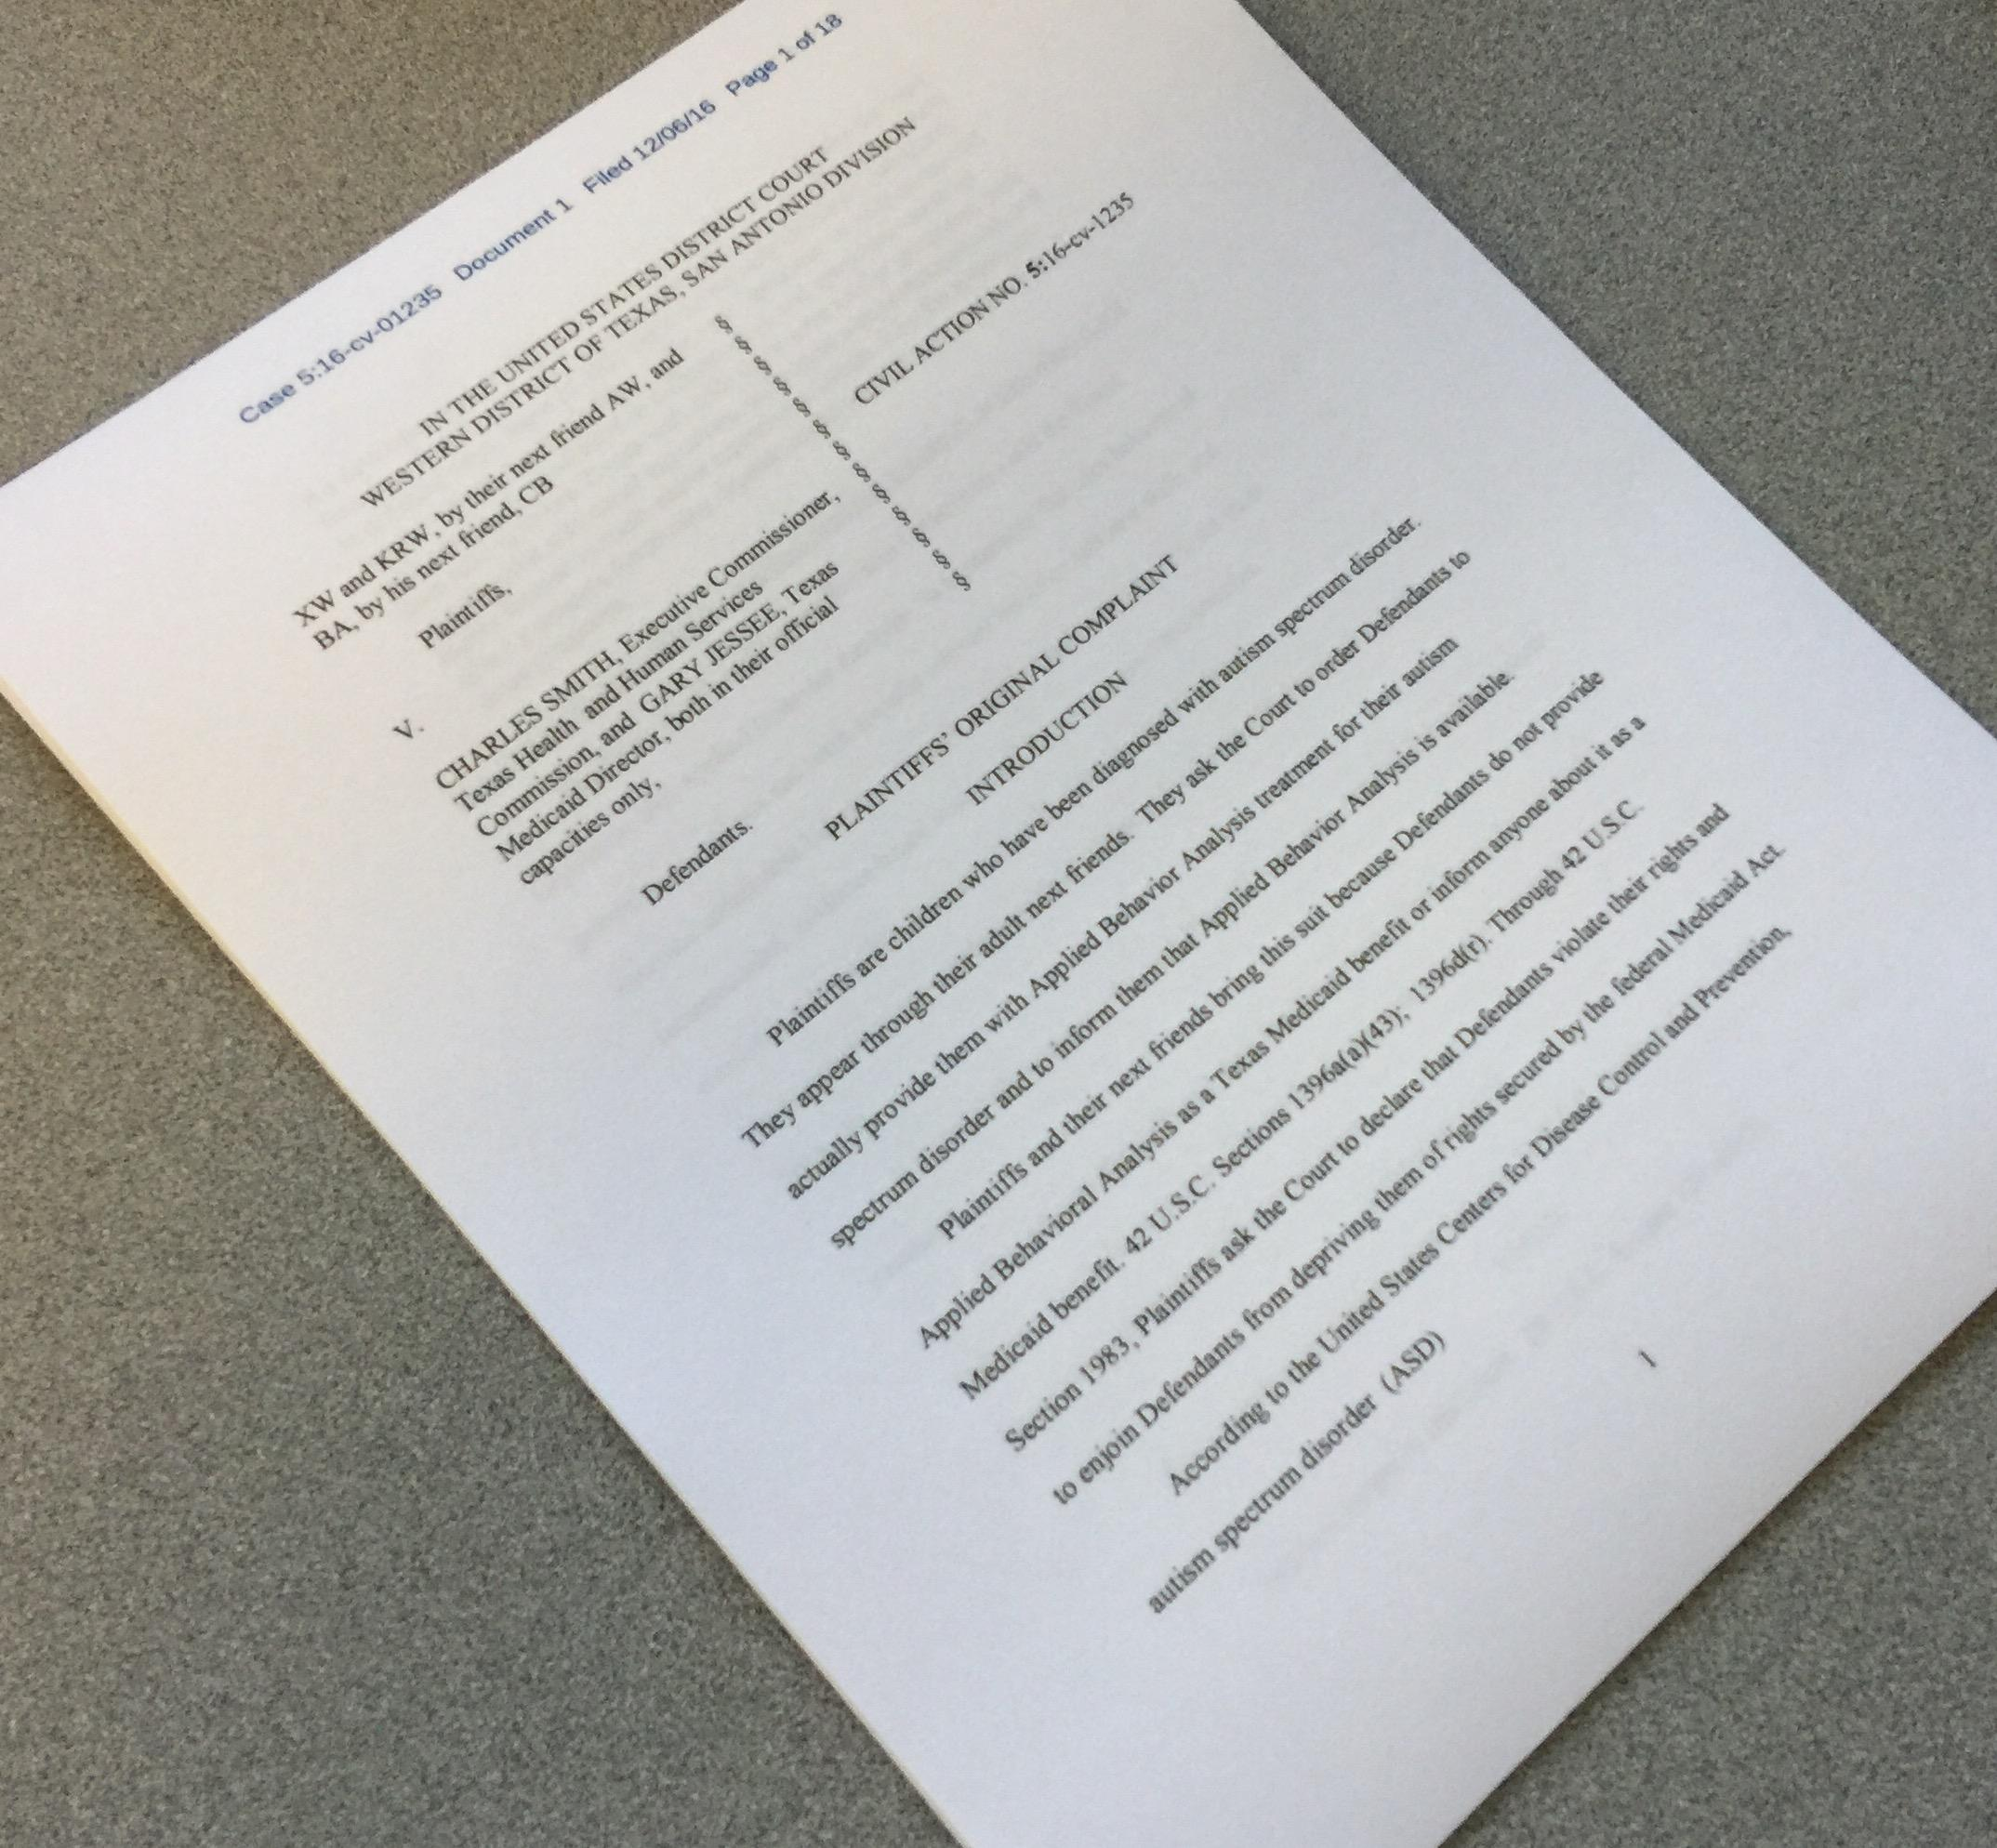 100 lawsuit josh duggar ashley madison dragged into lawsuit